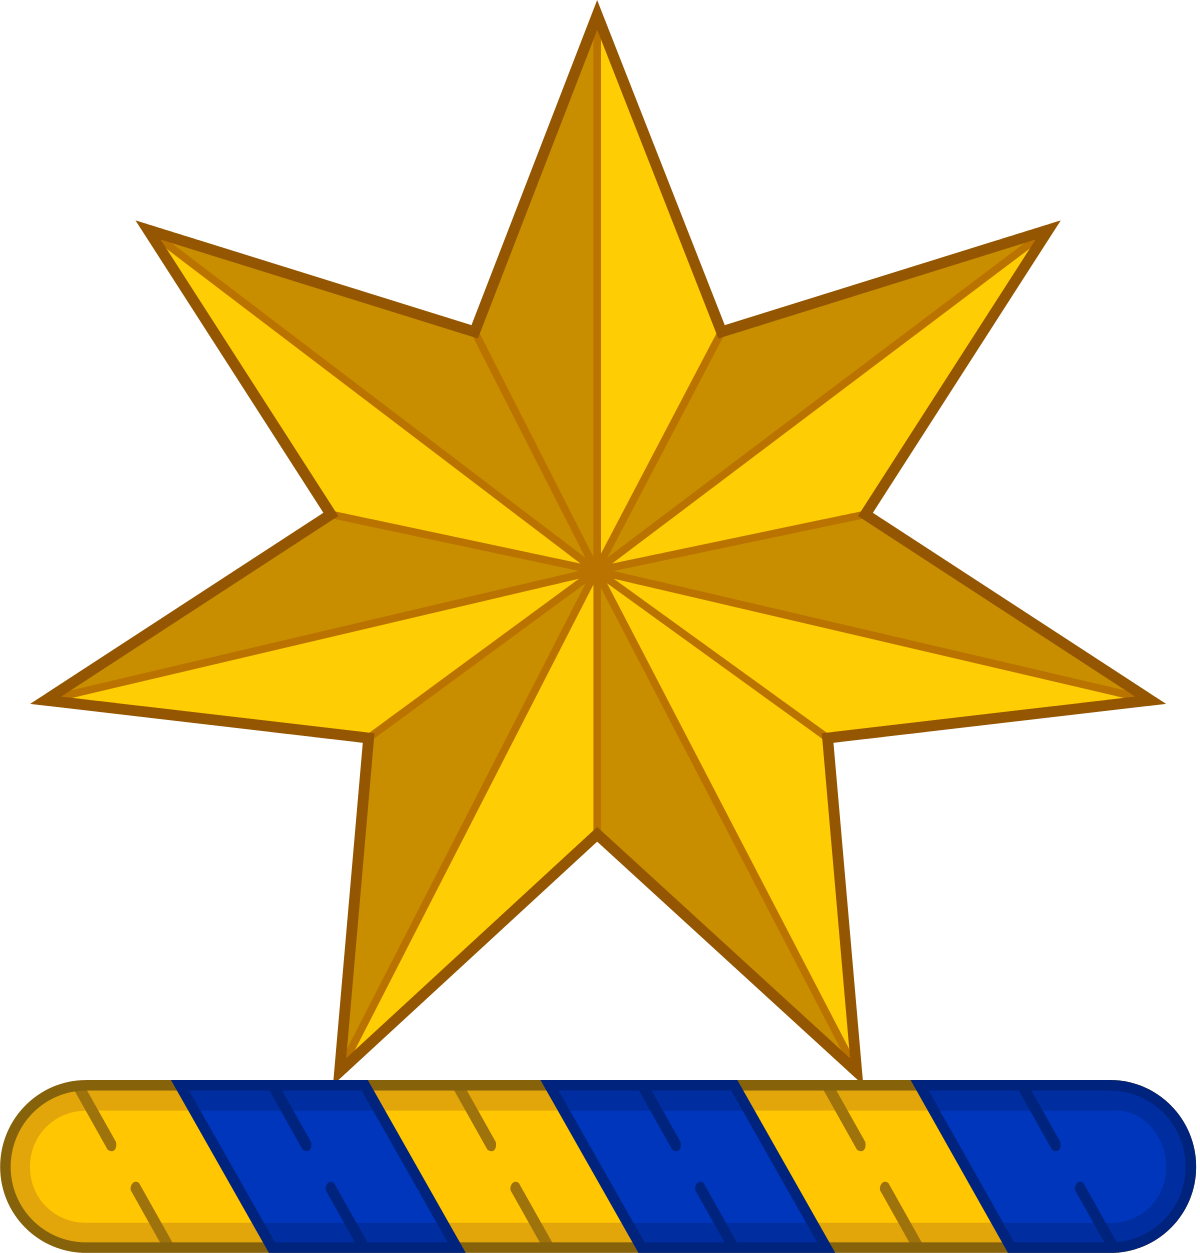 Commonwealth Star.